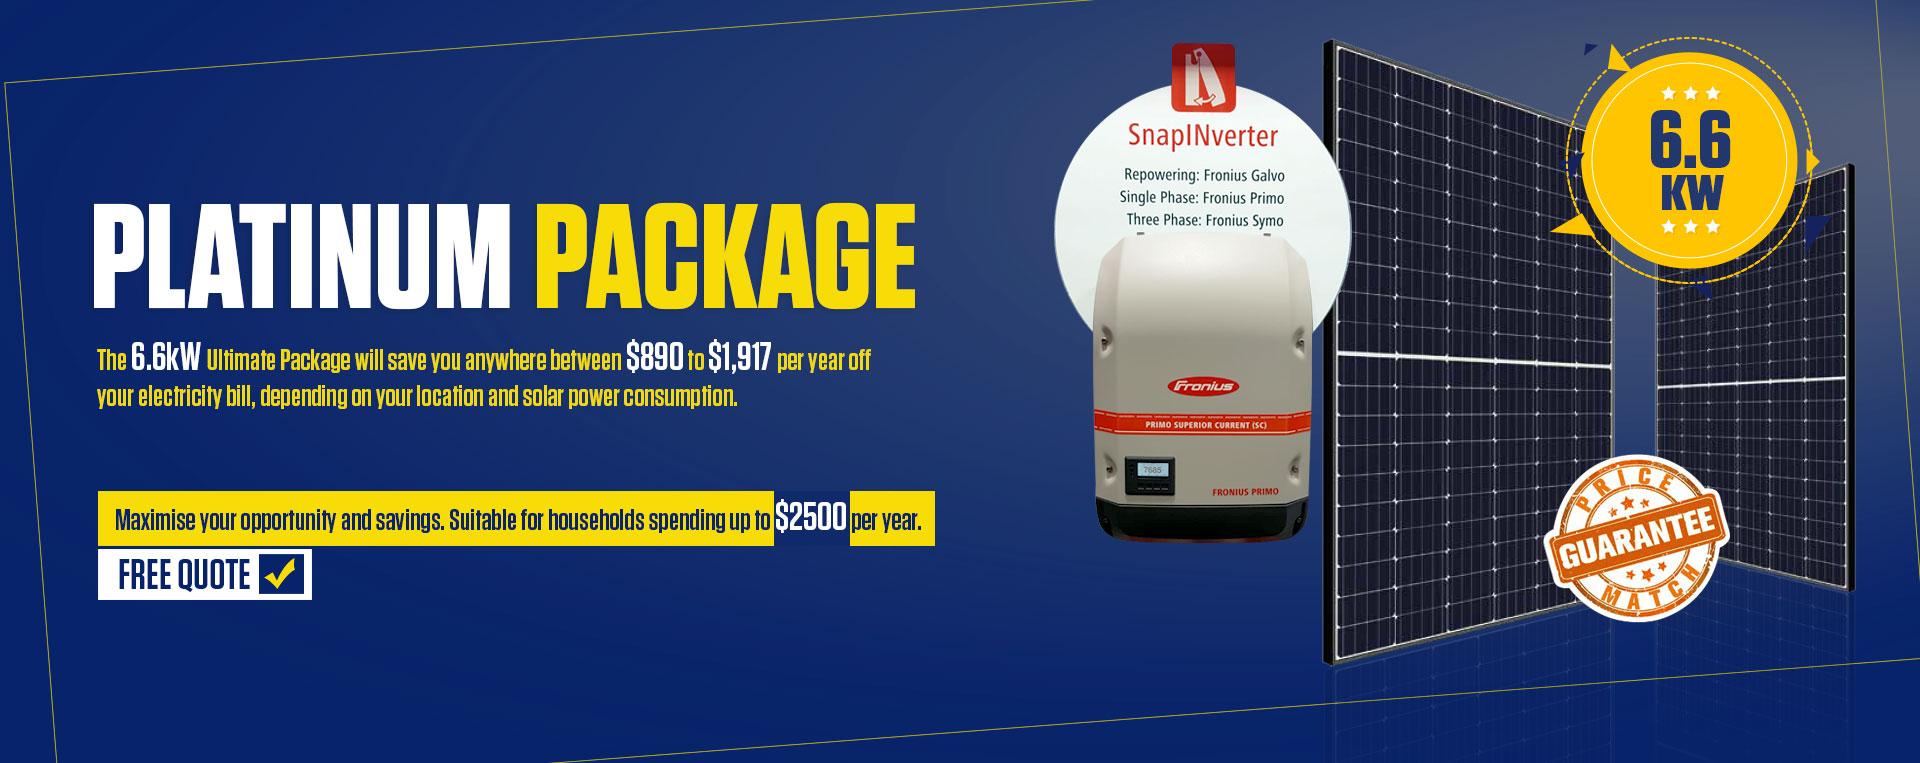 6.6 kW Ultimate Package